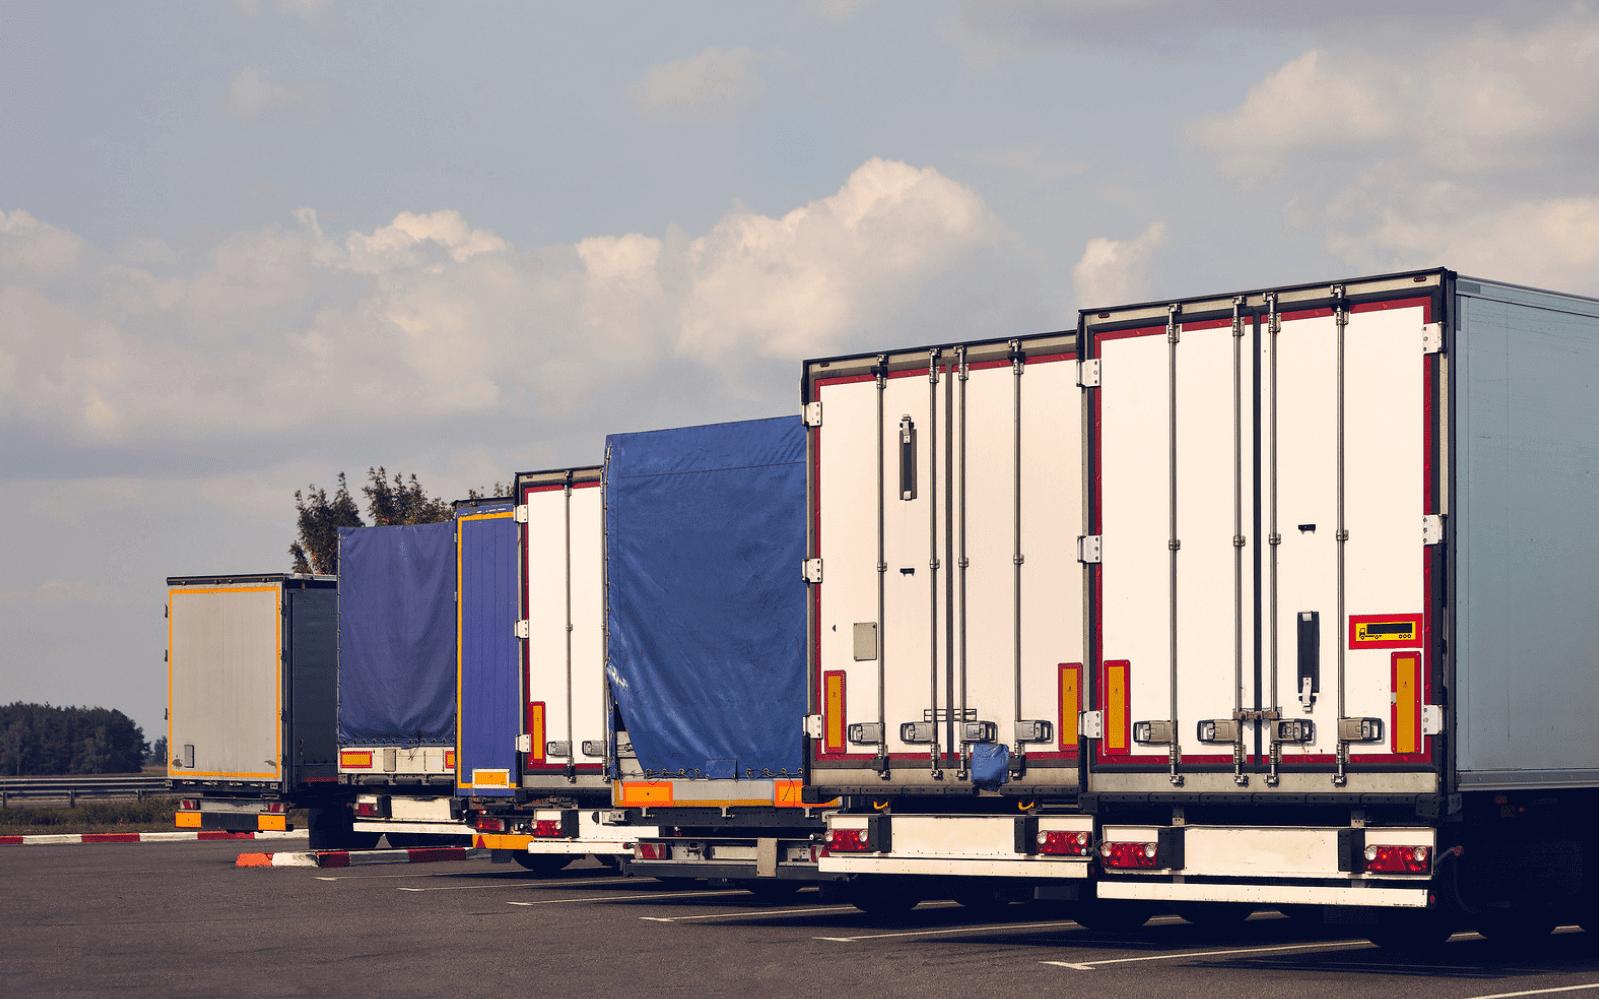 Lorries parked at truckstop